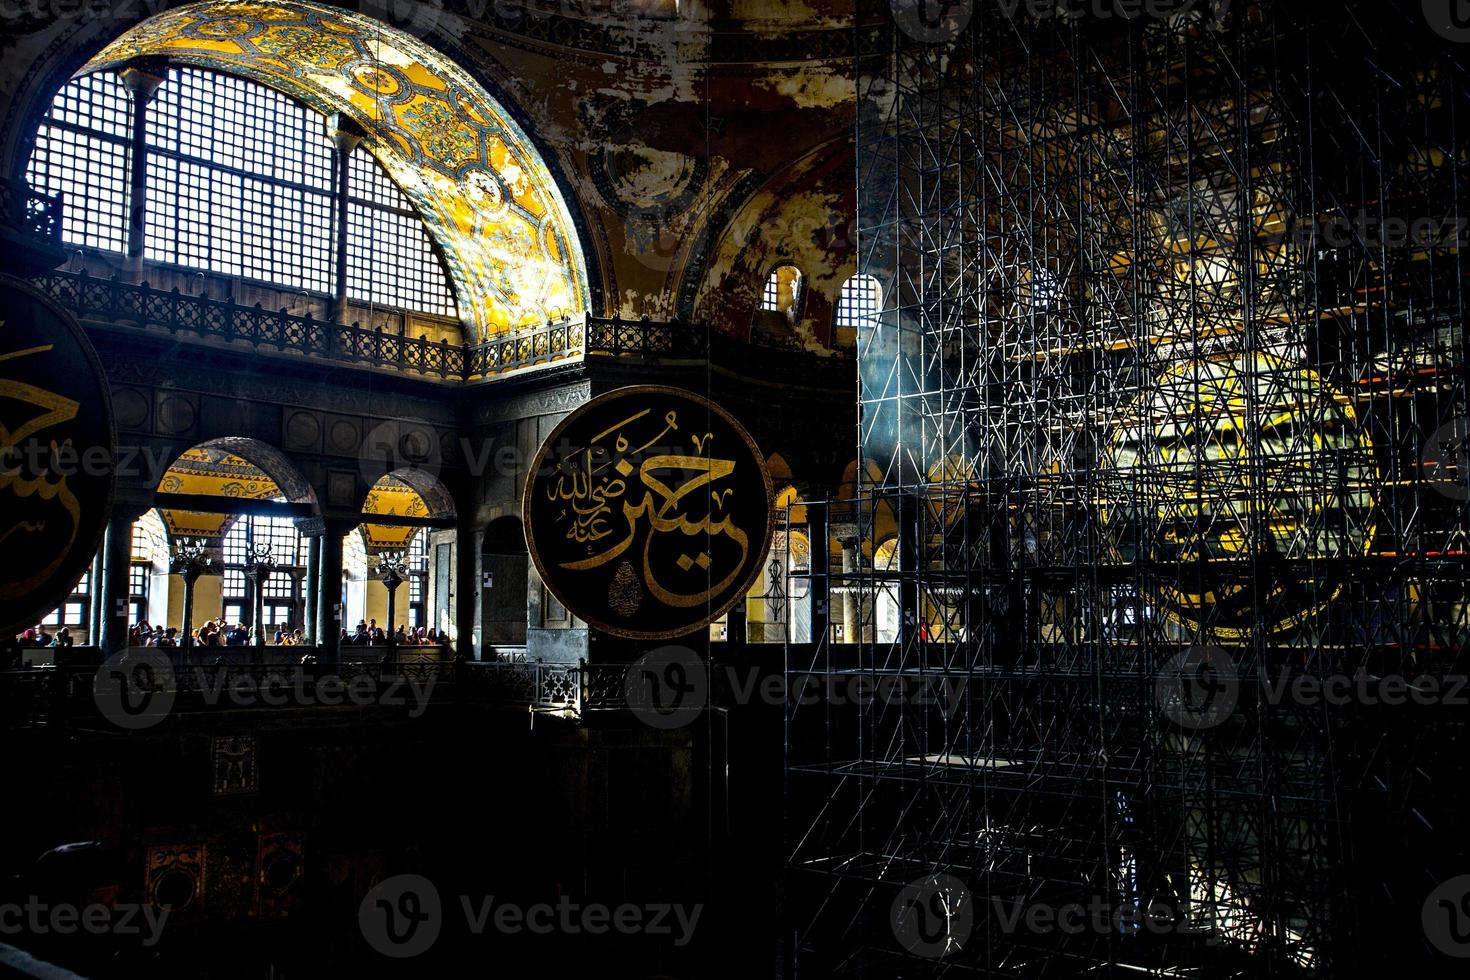 Hagia Sophia renovations photo